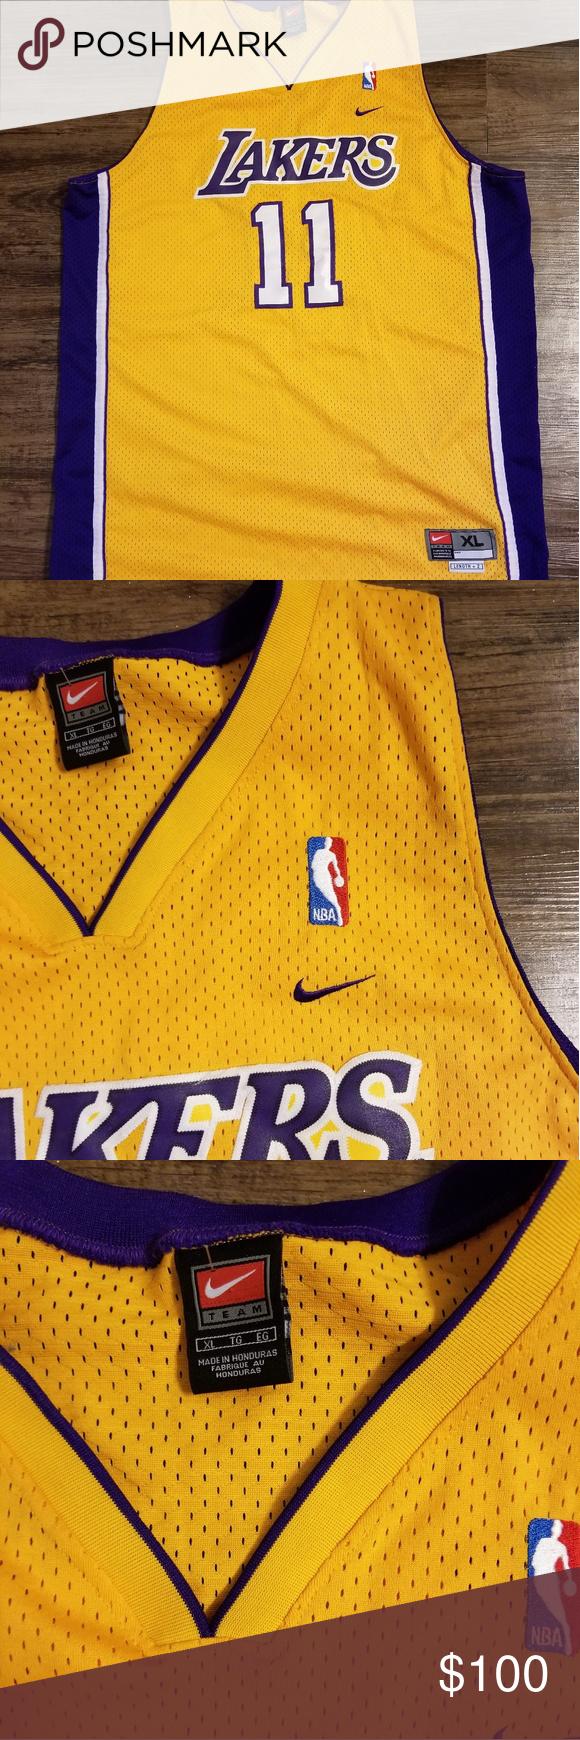 7befe6b9802 Vintage New Nike Karl Malone Lakers Jersey Size XL + 2 Vintage new Nike #11  Karl Malone Jersey. Nike Shirts